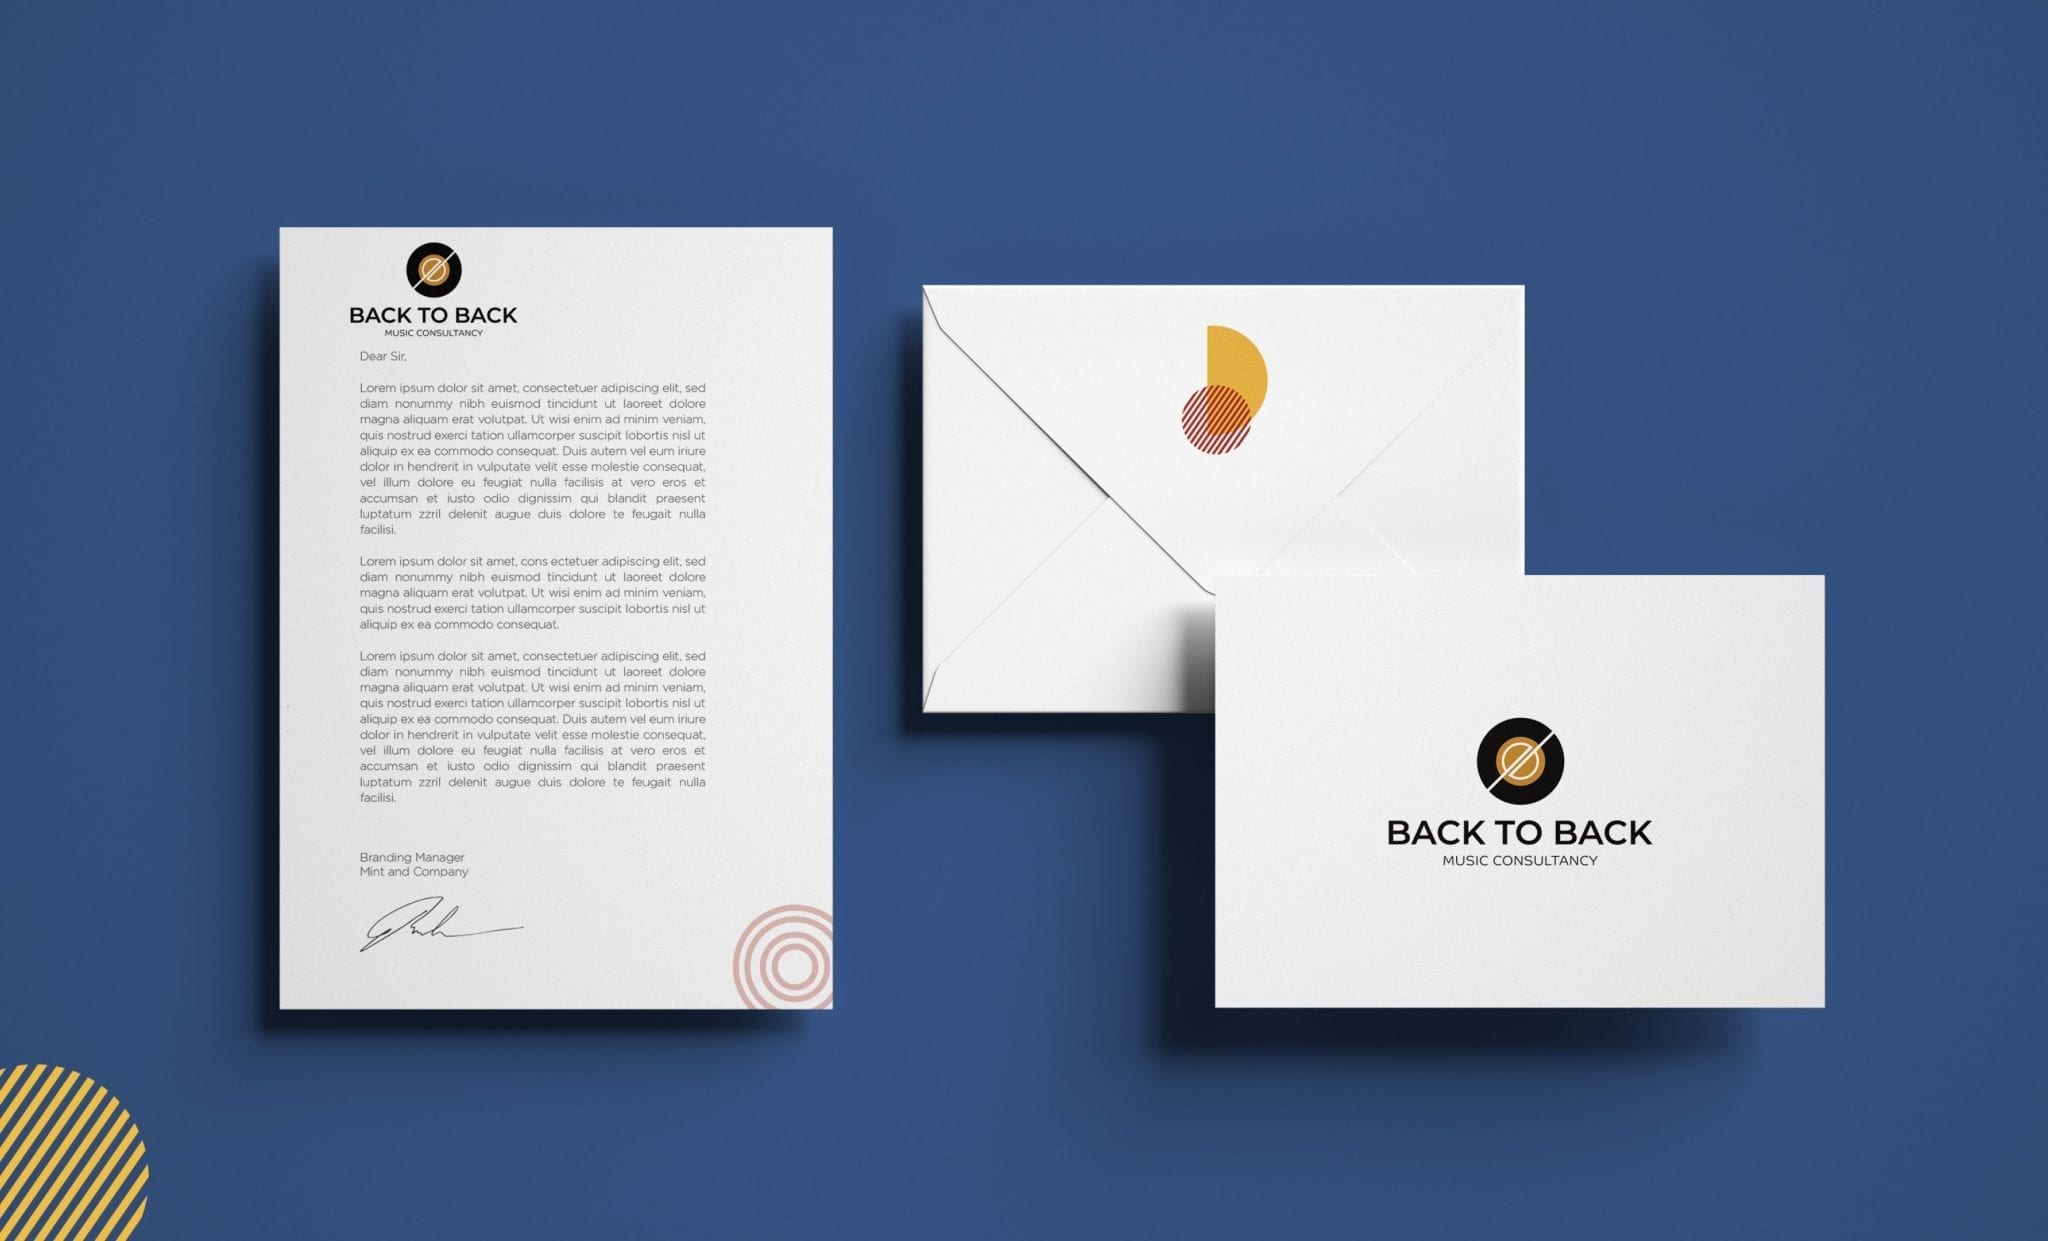 Back to Back Branding Guidelines9